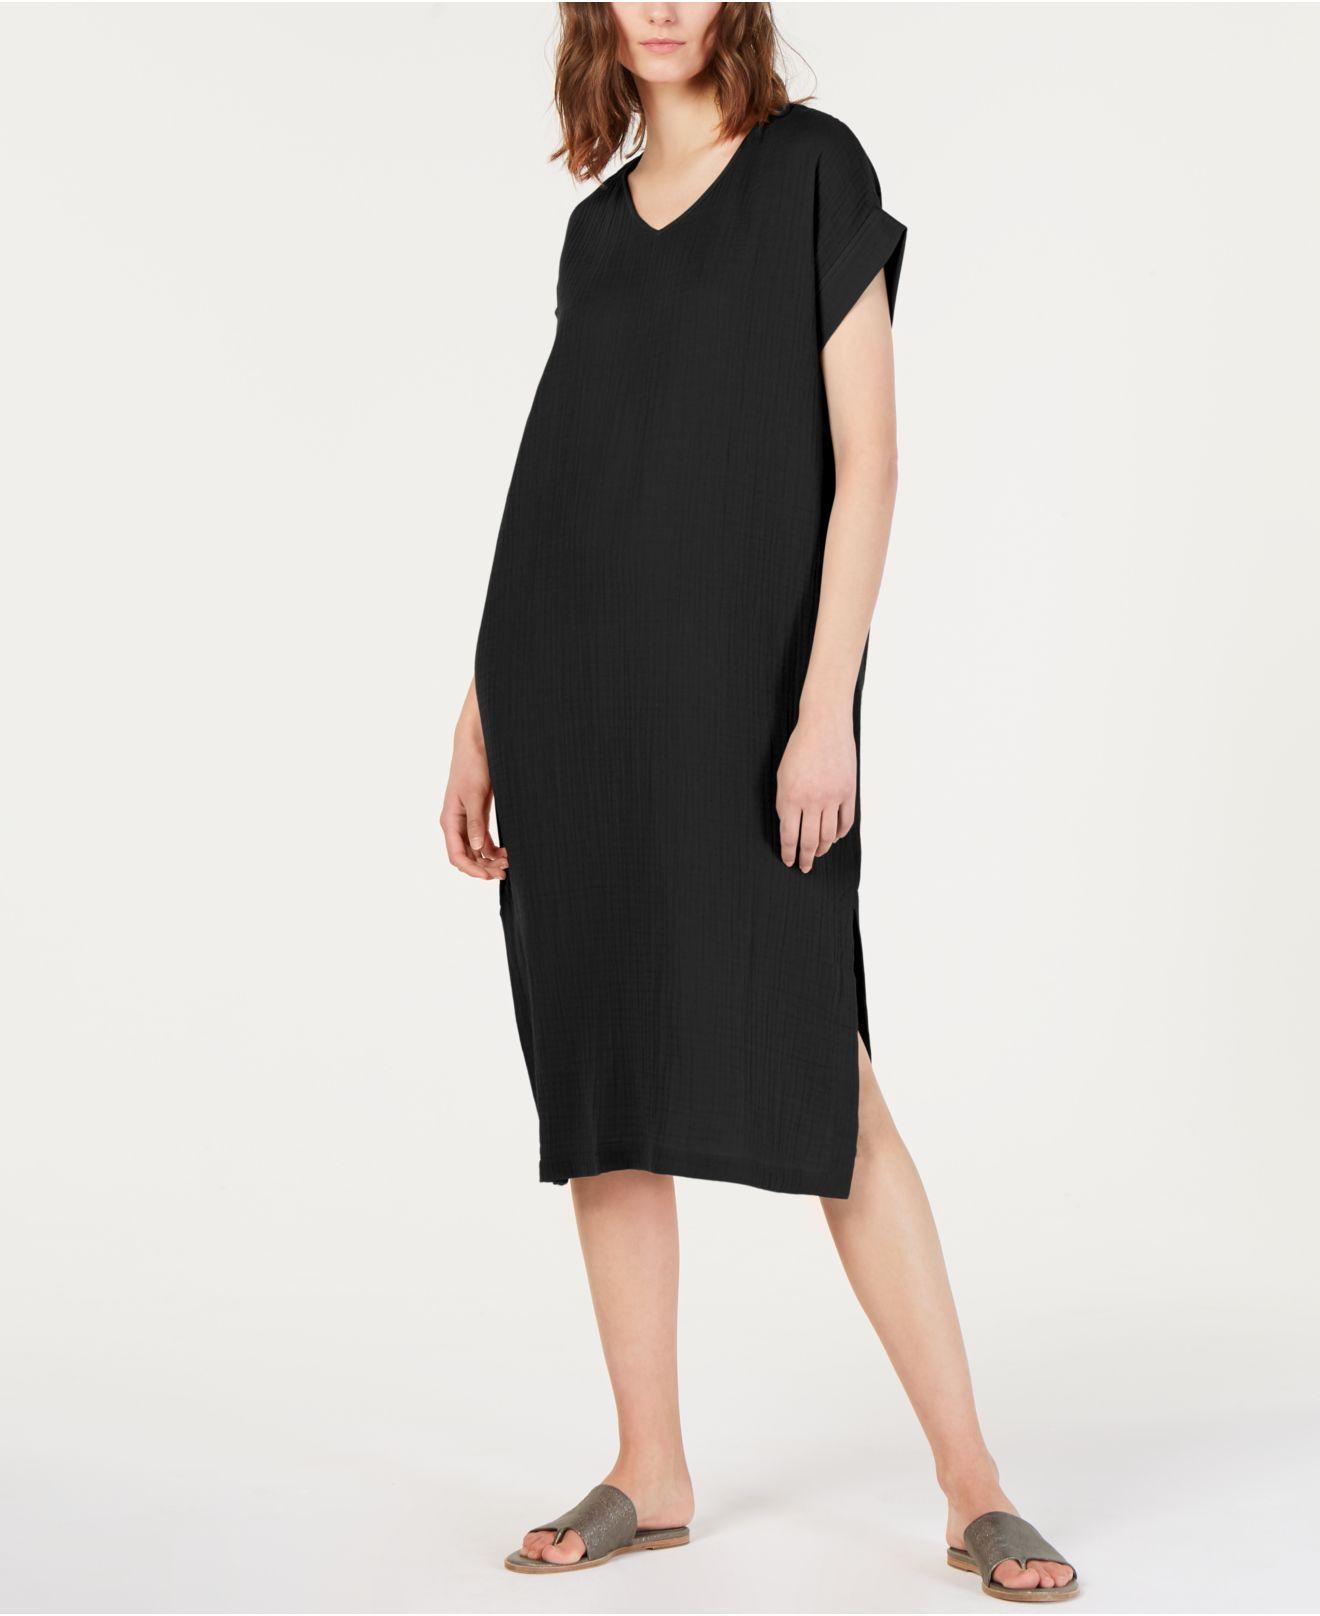 5780d7e58f32d7 Eileen Fisher. Women s Black Organic Cotton Crinkled Dress ...